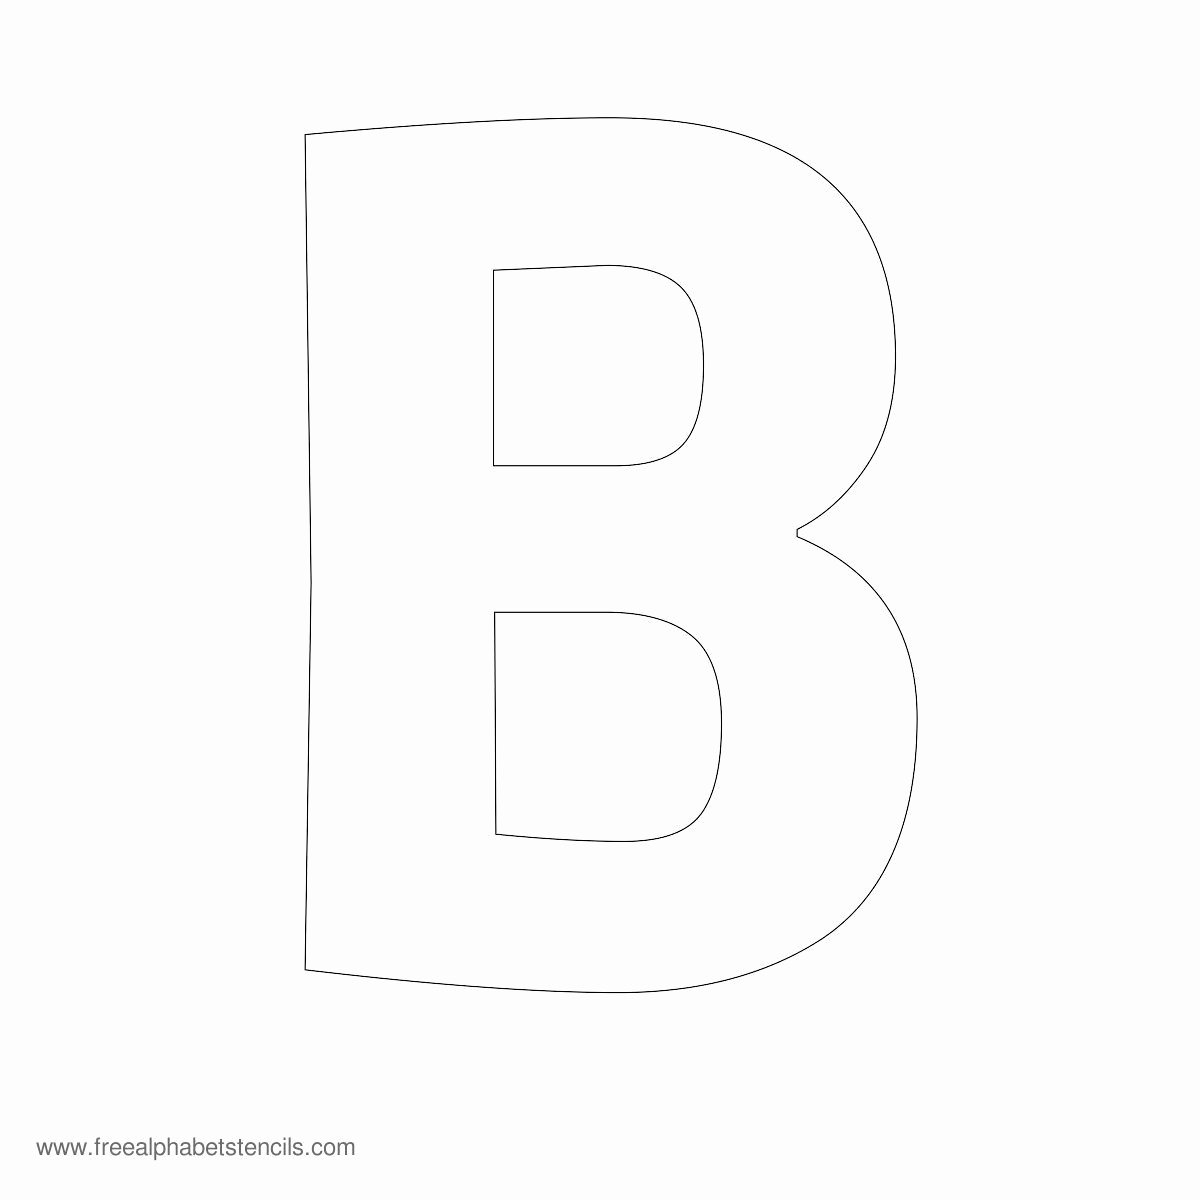 Free Printable Alphabet Stencils Templates Beautiful Alphabet Stencil B Mrs Claus and Santa